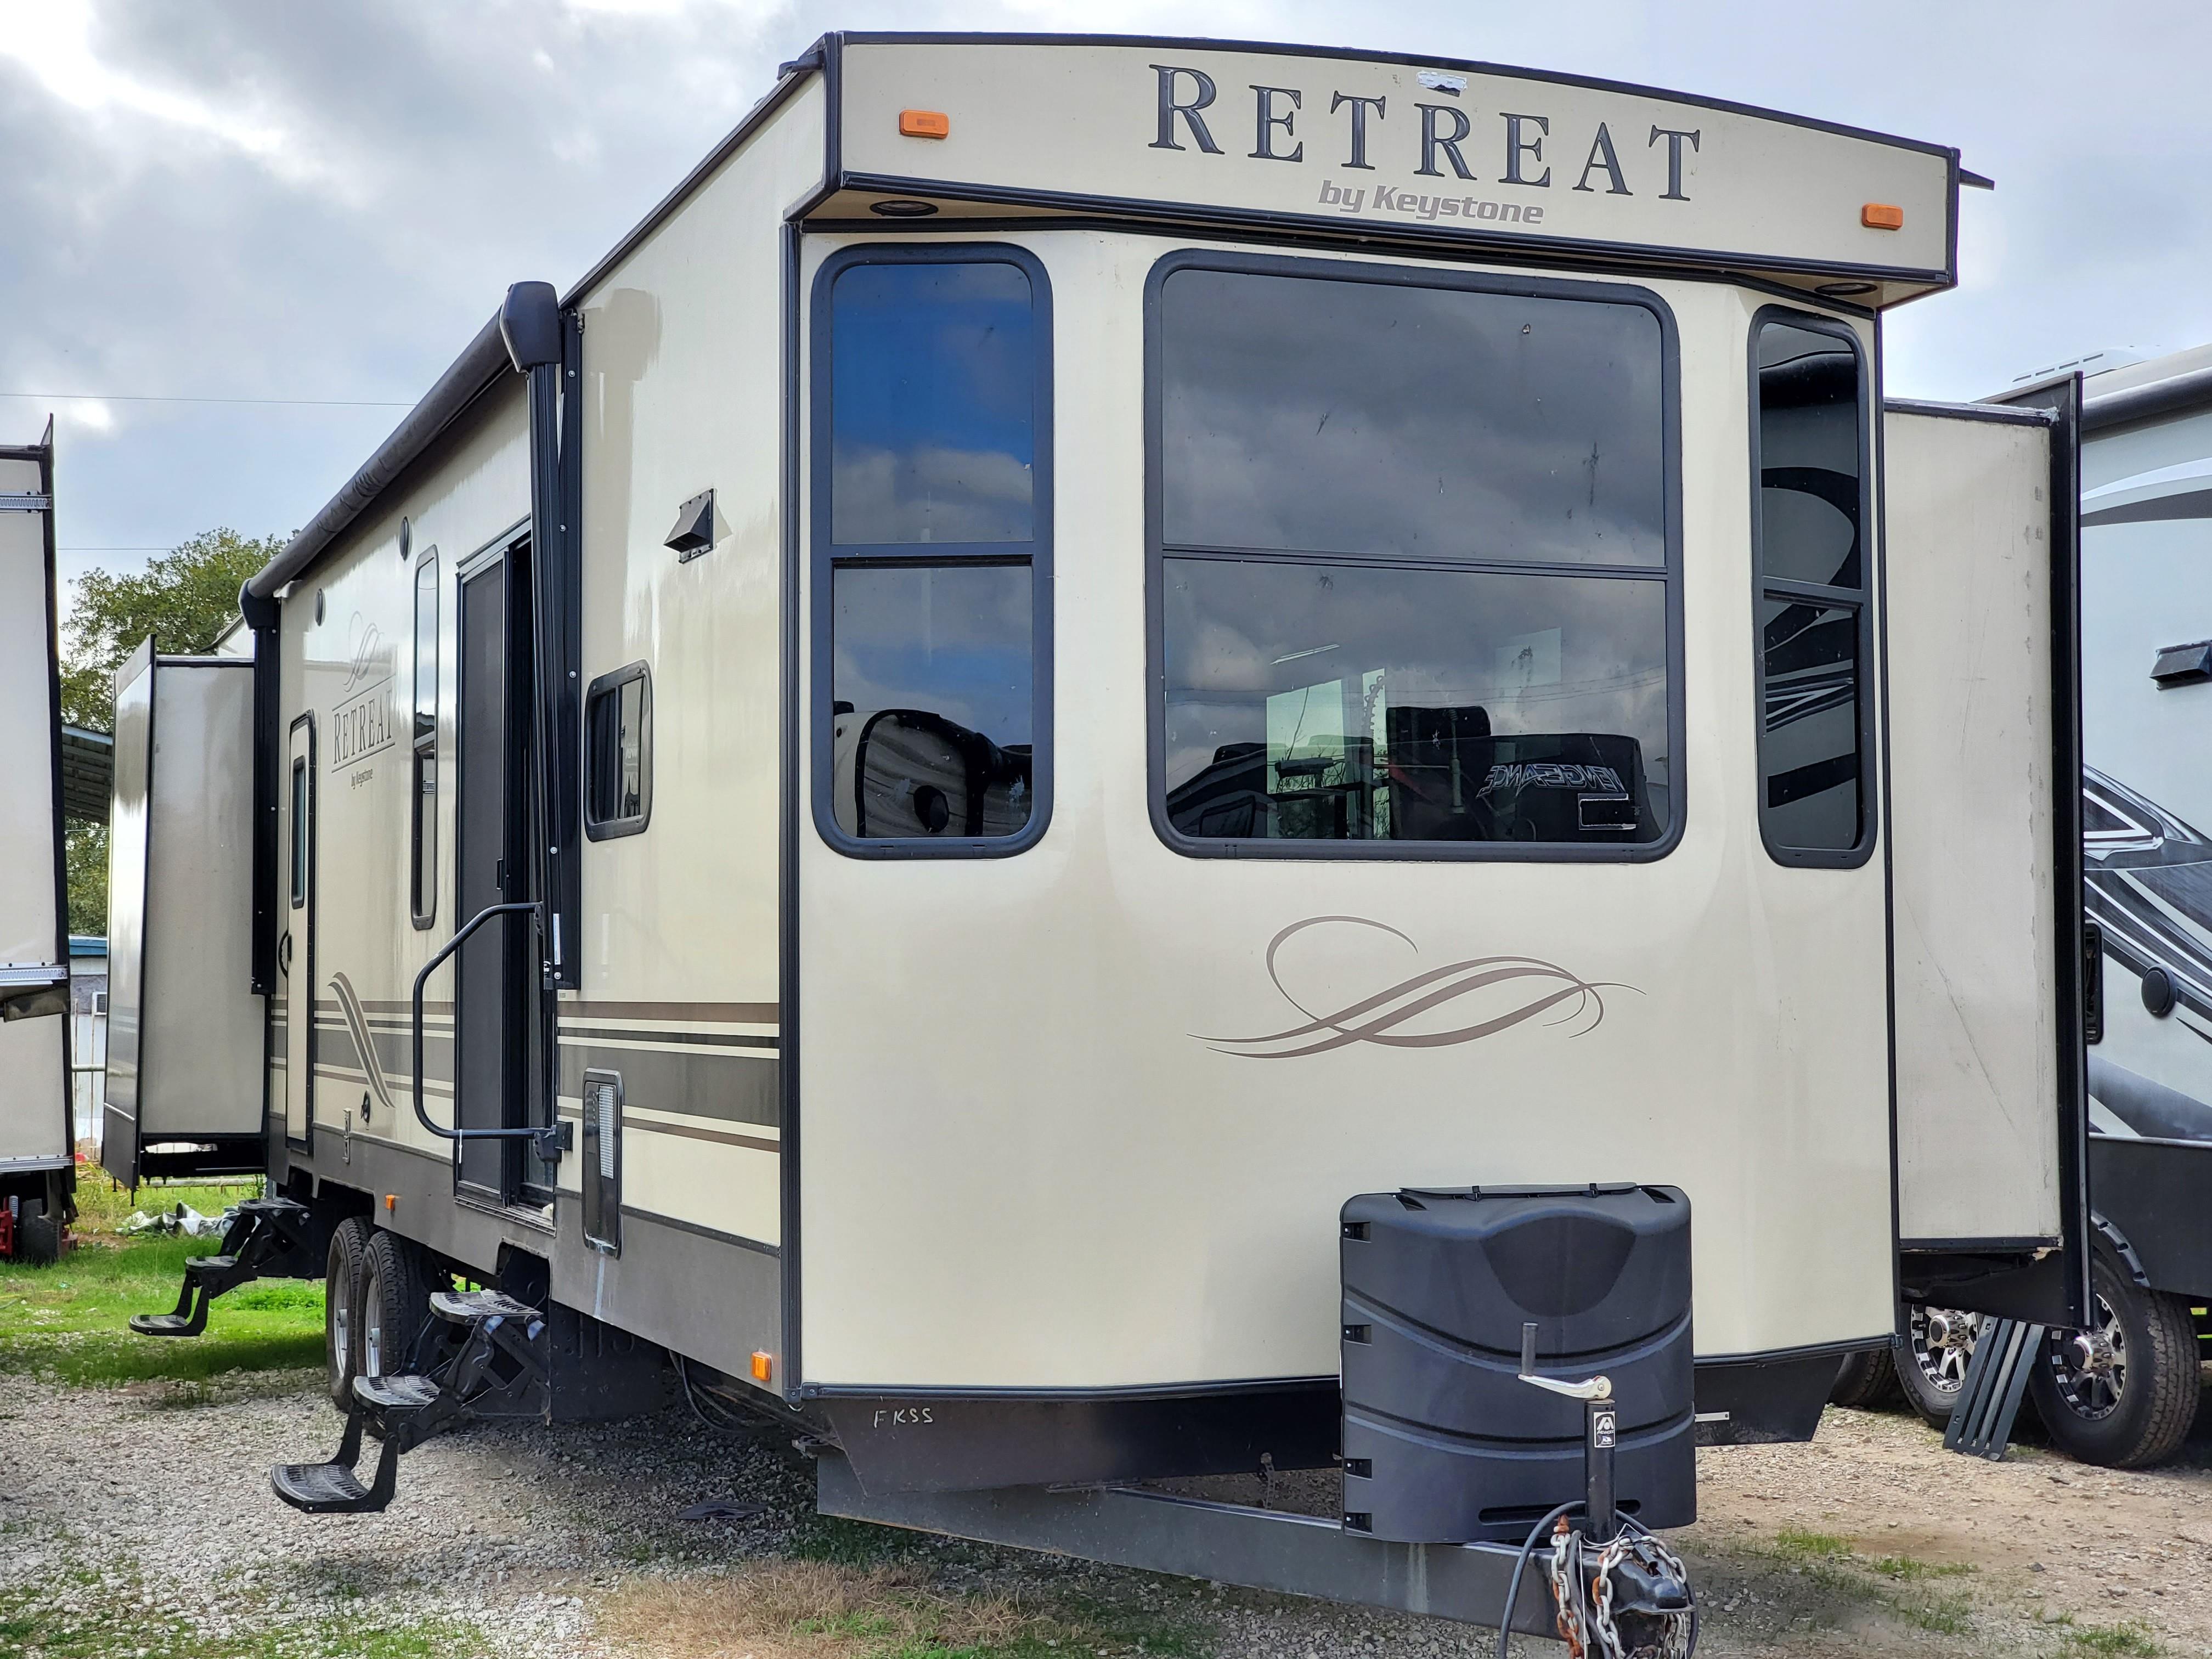 Used, 2018, Keystone, Retreat 391FKSS, Destination Trailers